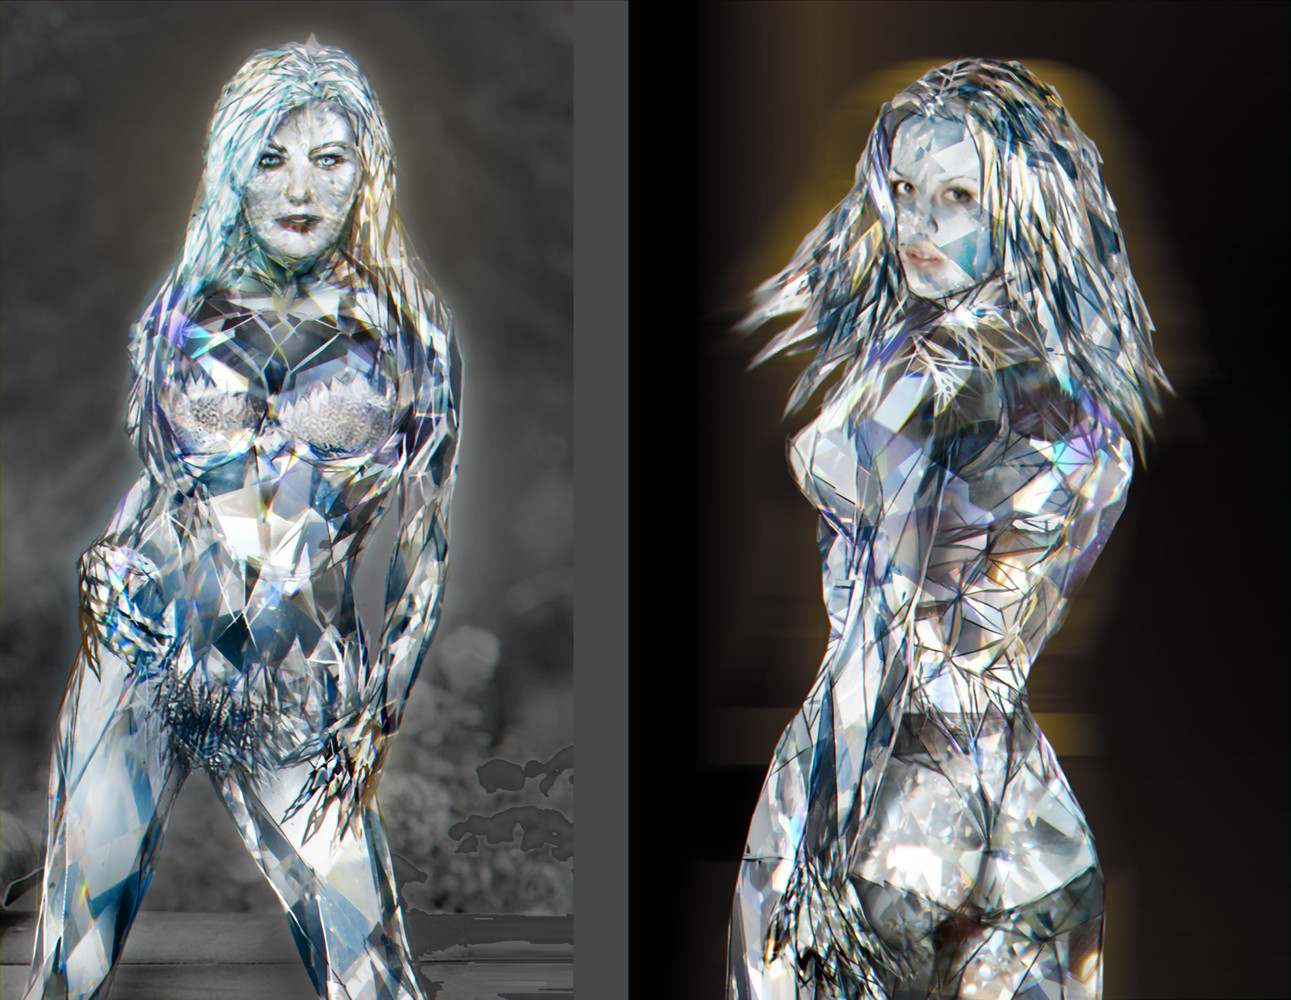 crystalGirl2.jpg